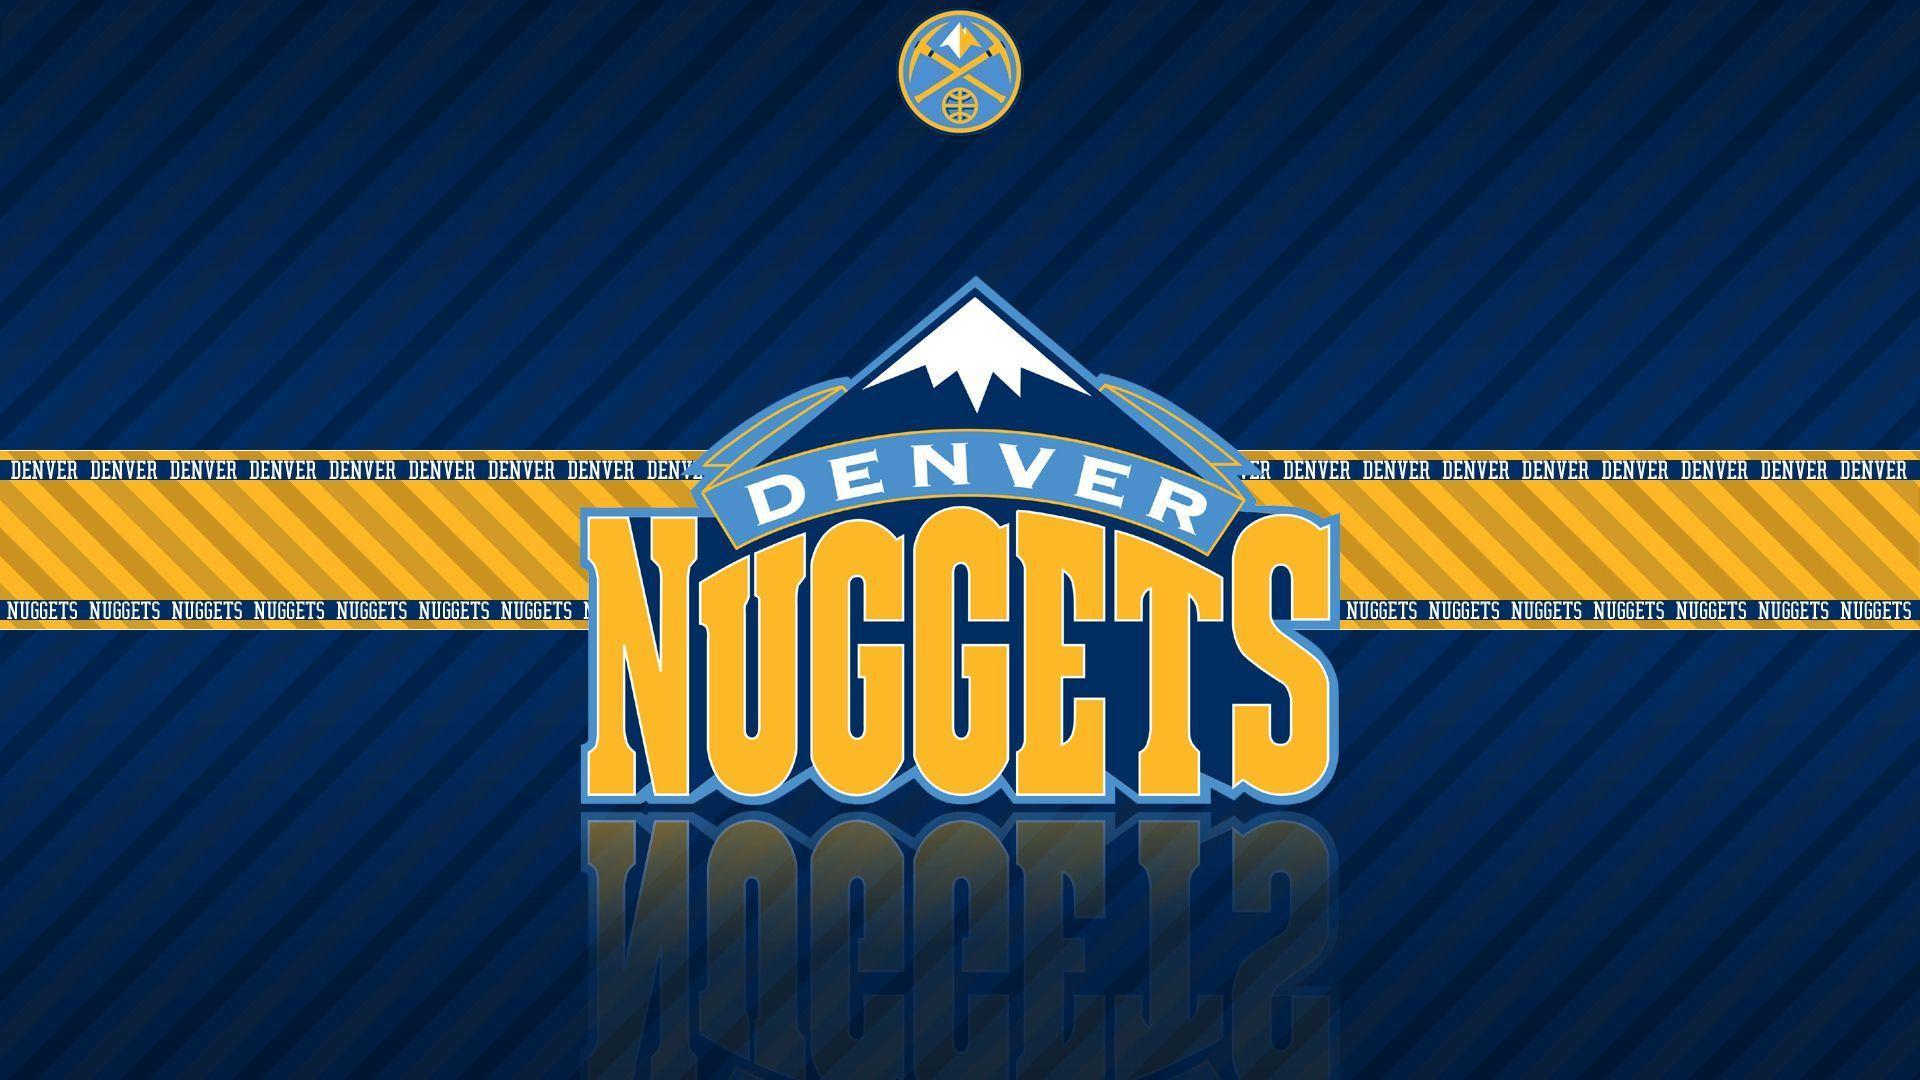 Denver Nuggets #464077 | Full HD Widescreen wallpapers for desktop ...